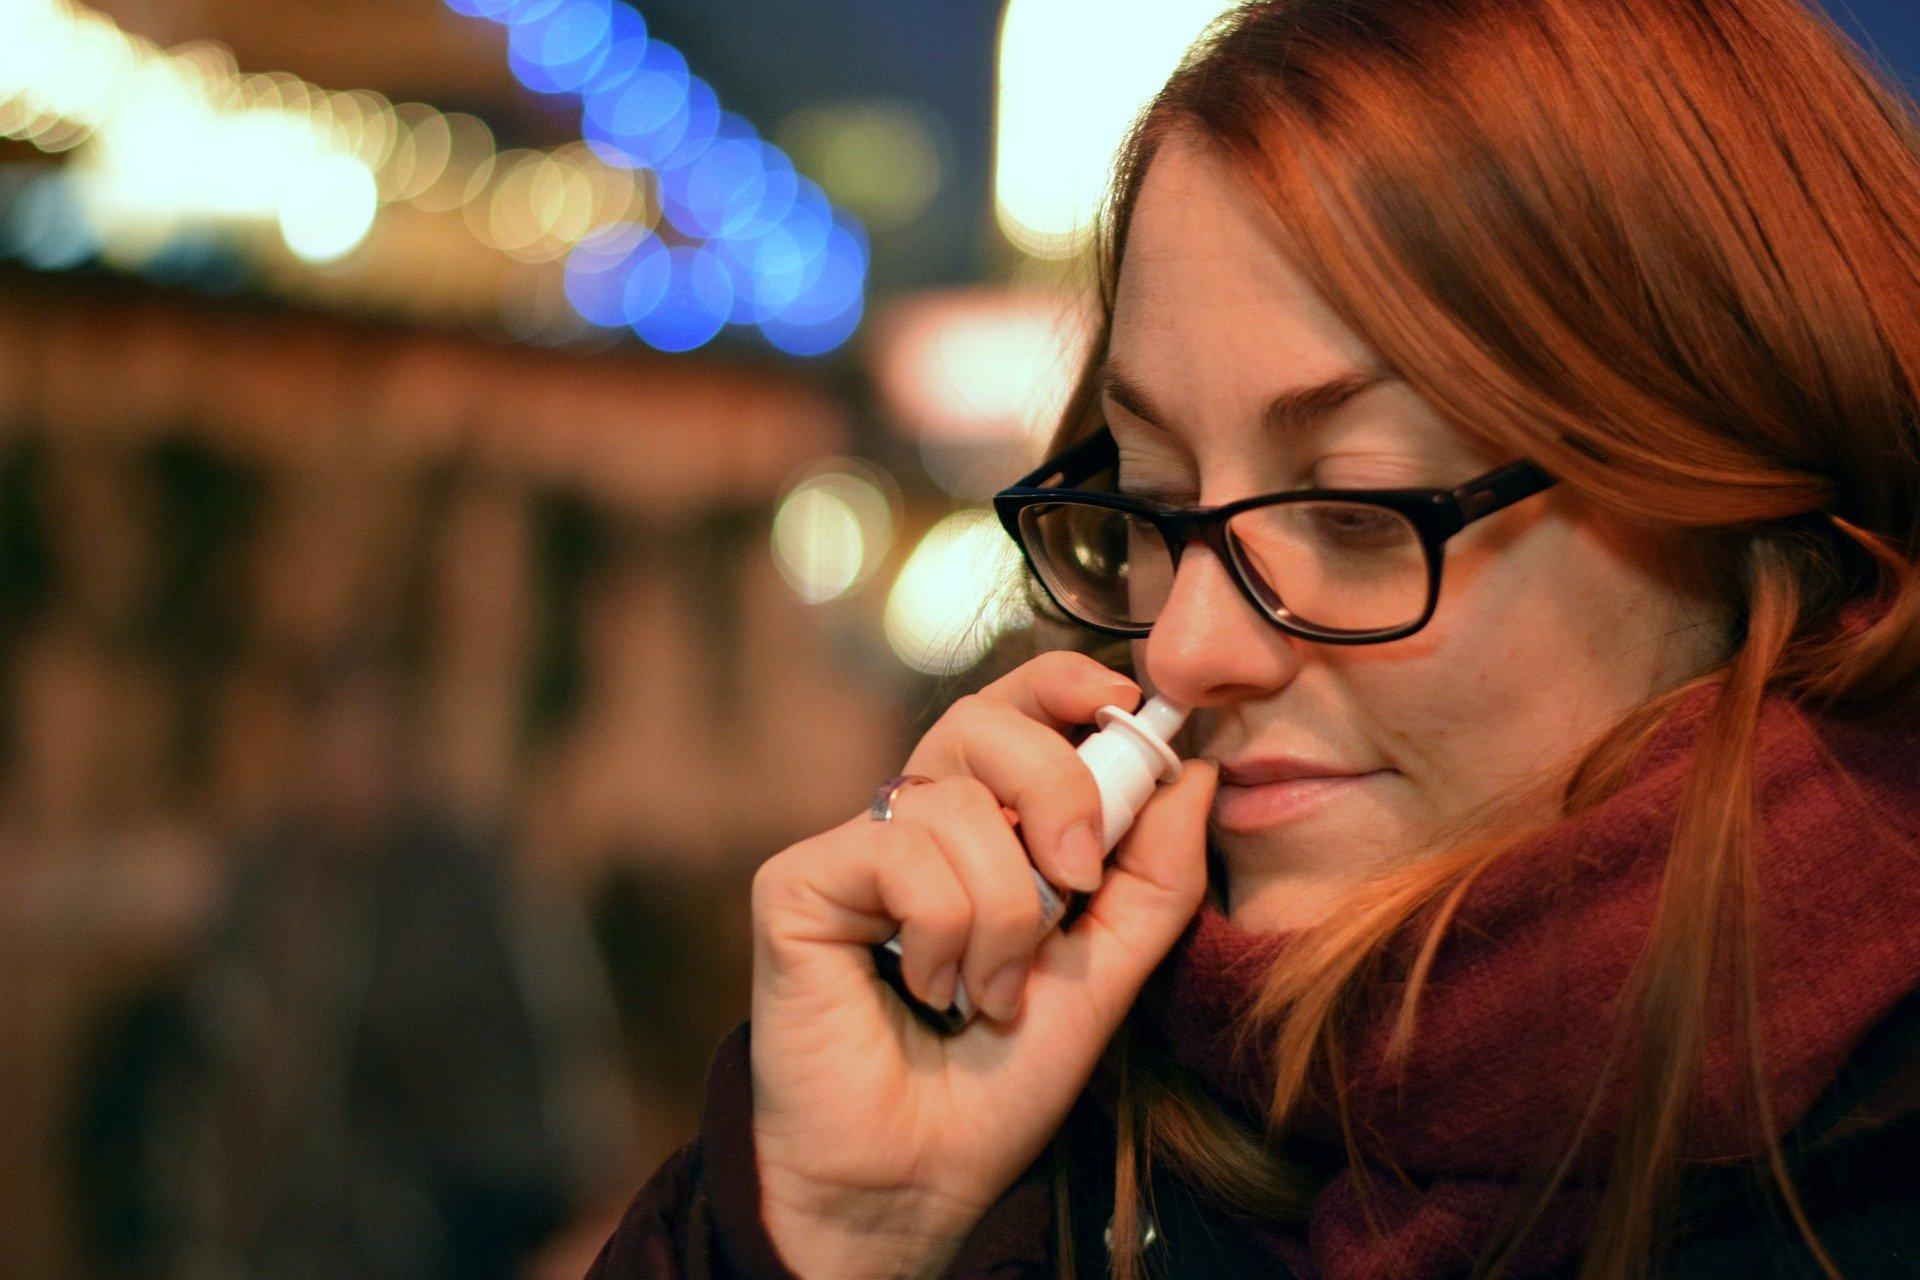 Coronavirus : Attention, n'utilisez pas de spray nasal !